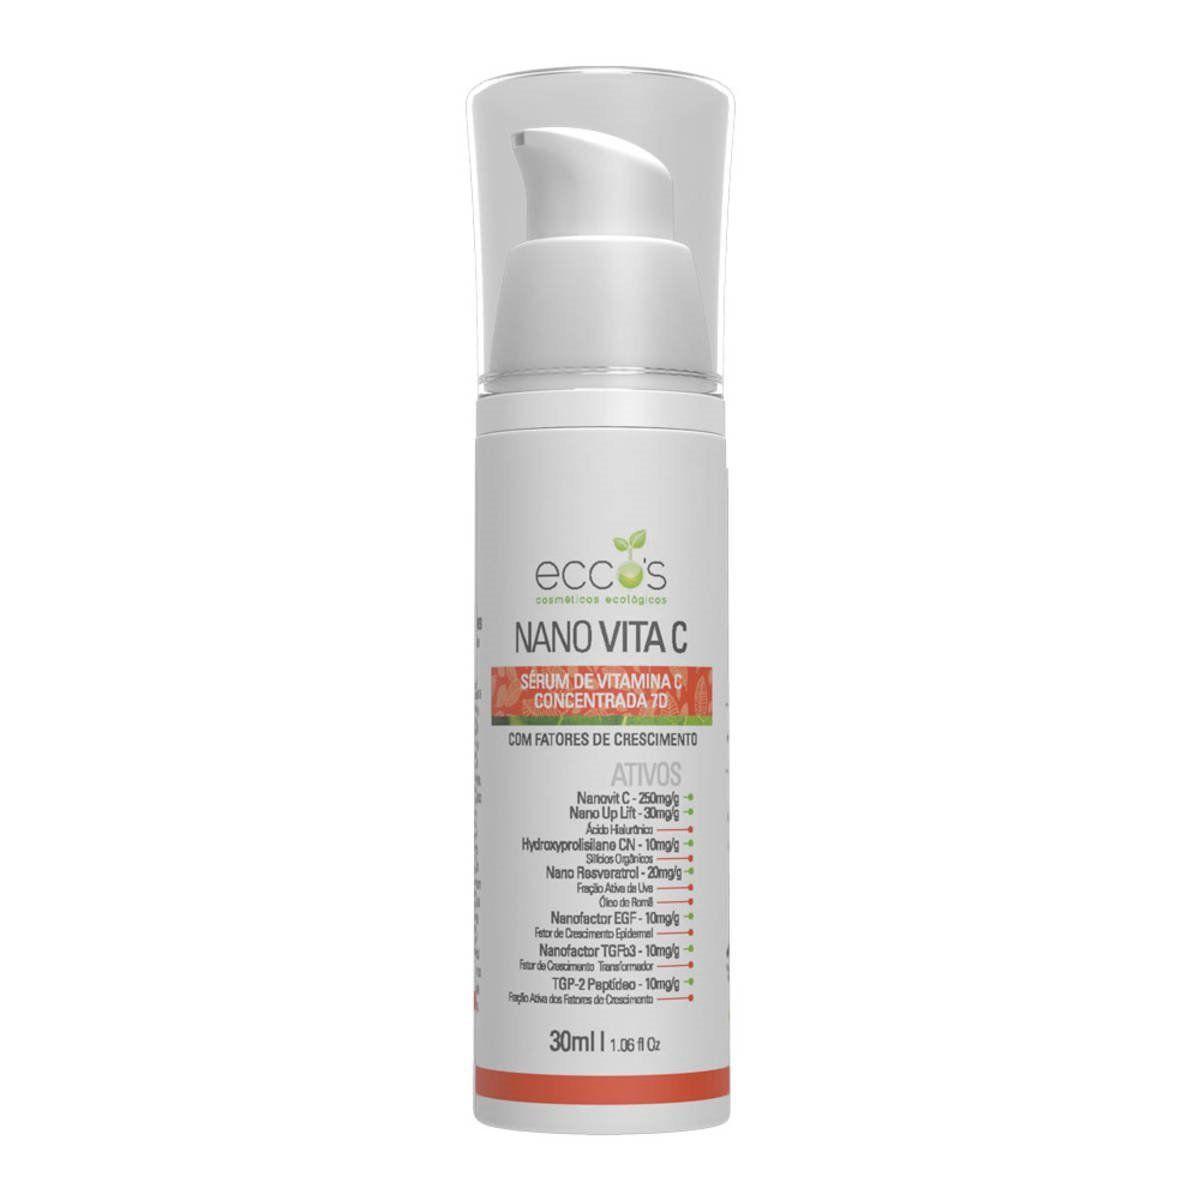 Nano Vita C Serum Concentrado de Vitamina C Eccos 30 ml